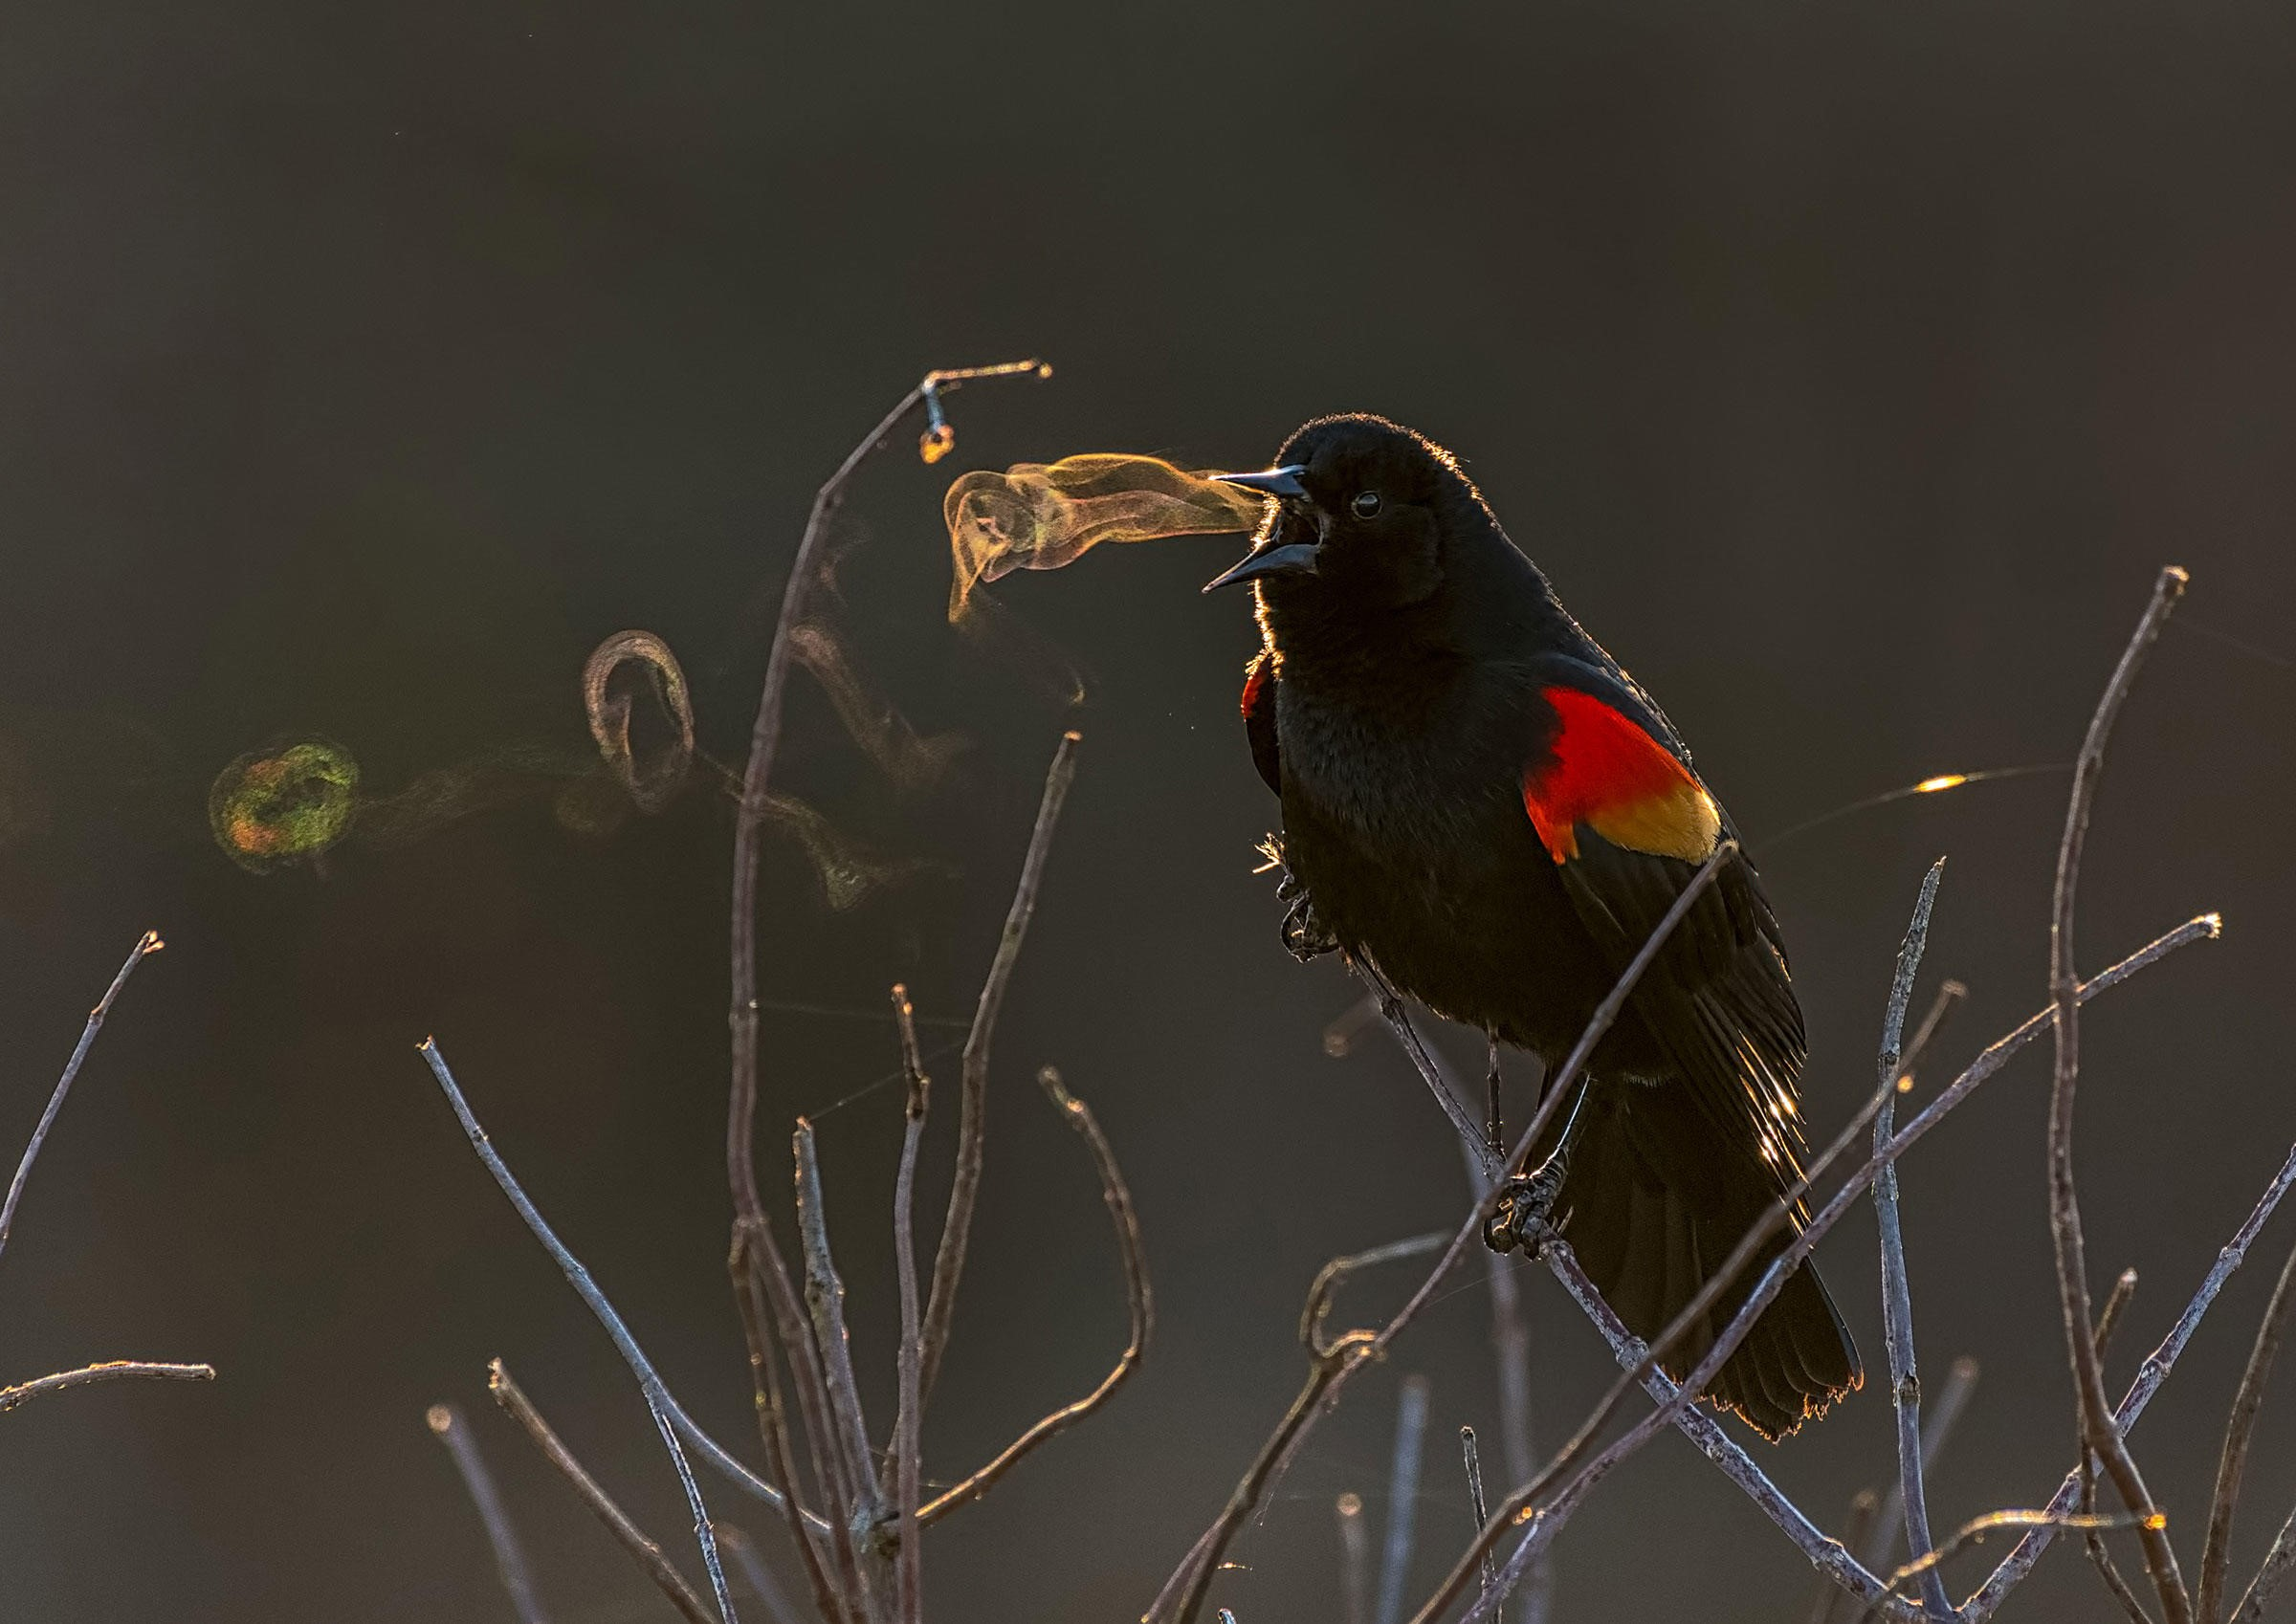 Wildlife Photo at Huntley Meadows Wins Top Audubon Prize